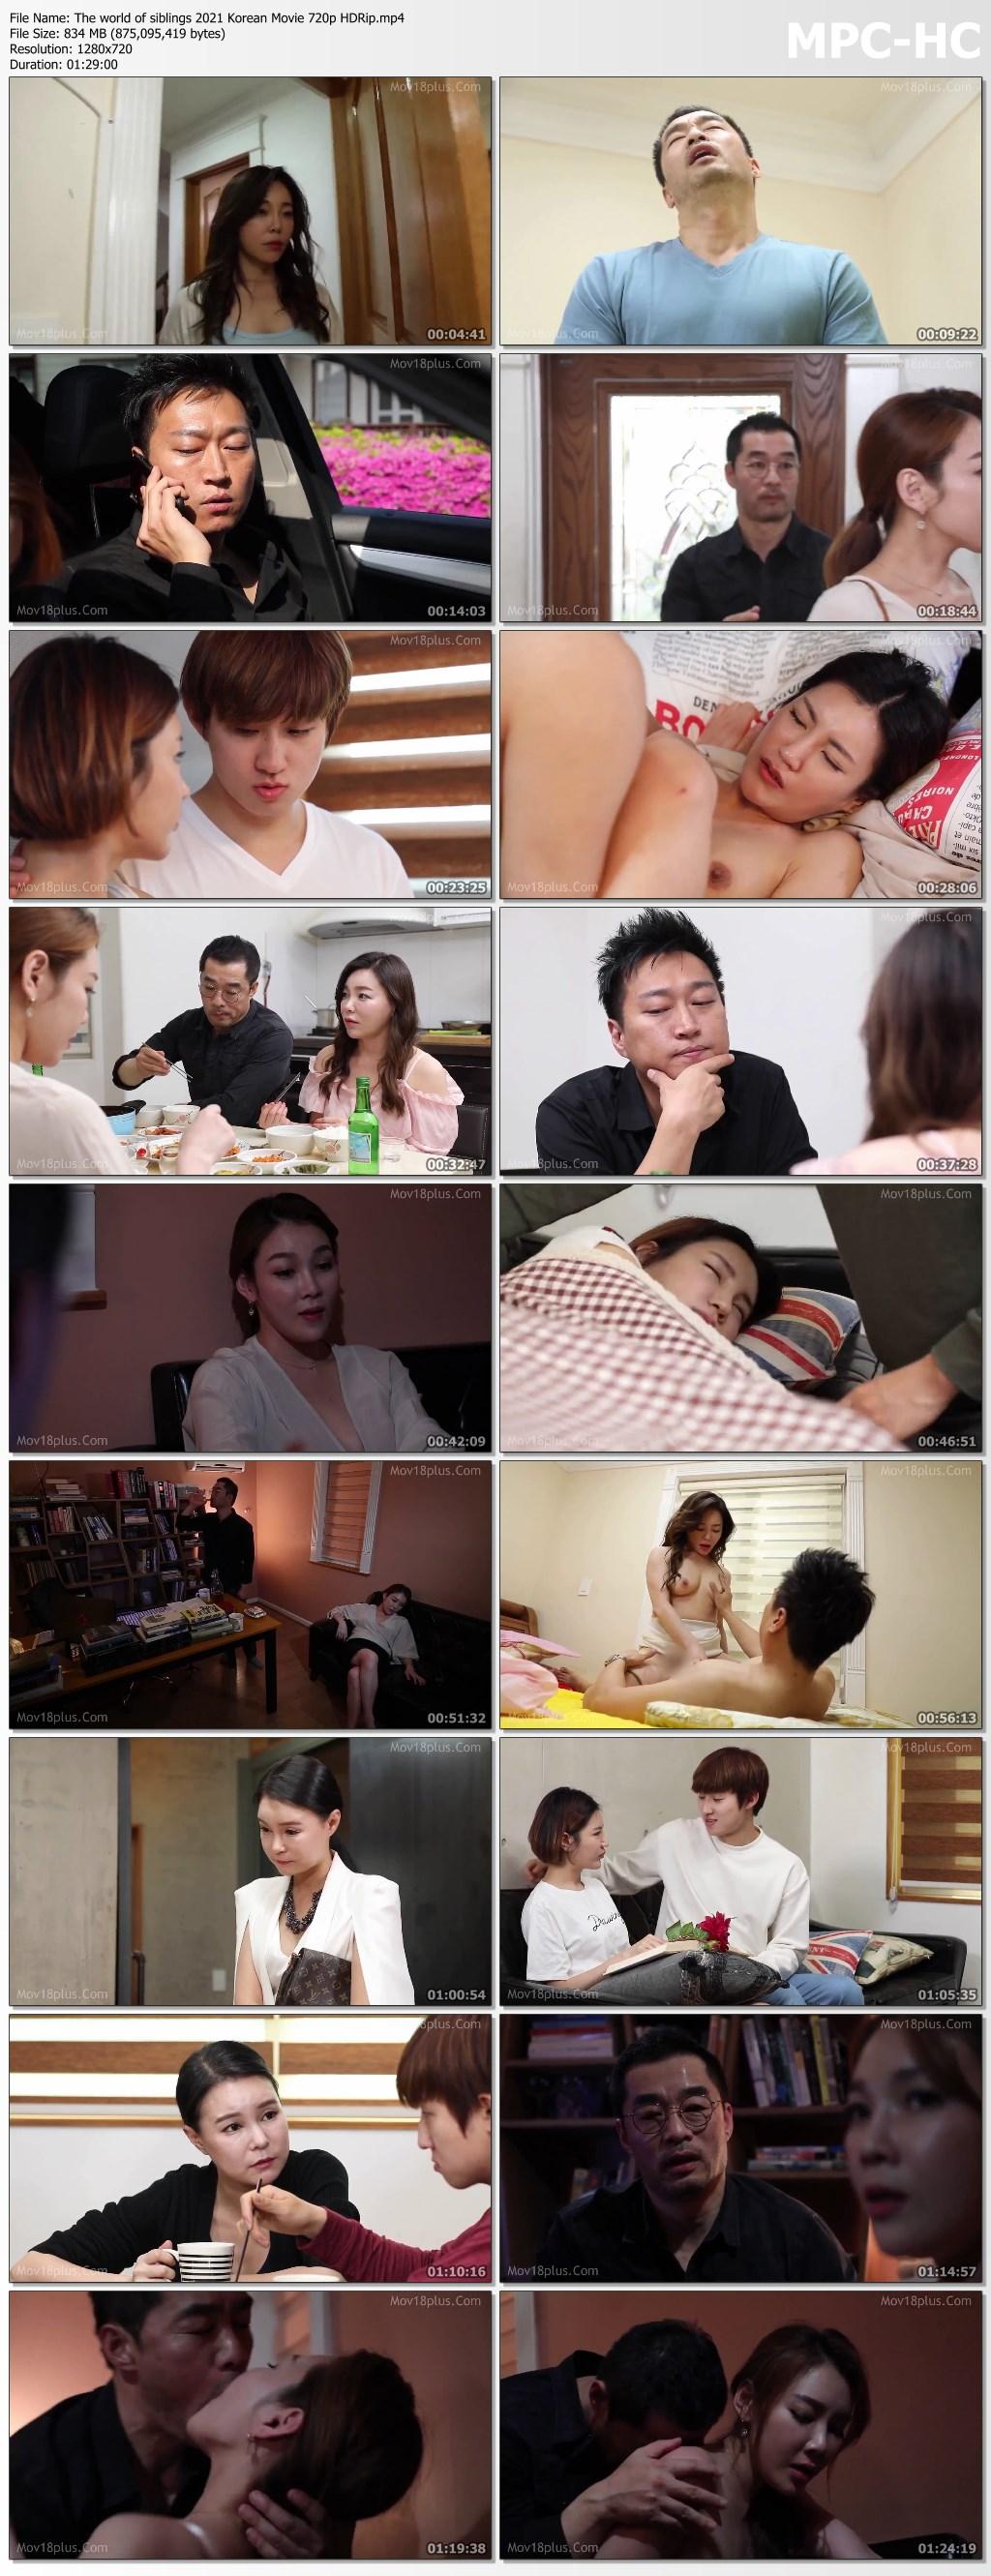 The world of siblings 2021 Korean Movie 720p HDRip.mp4 thumbs